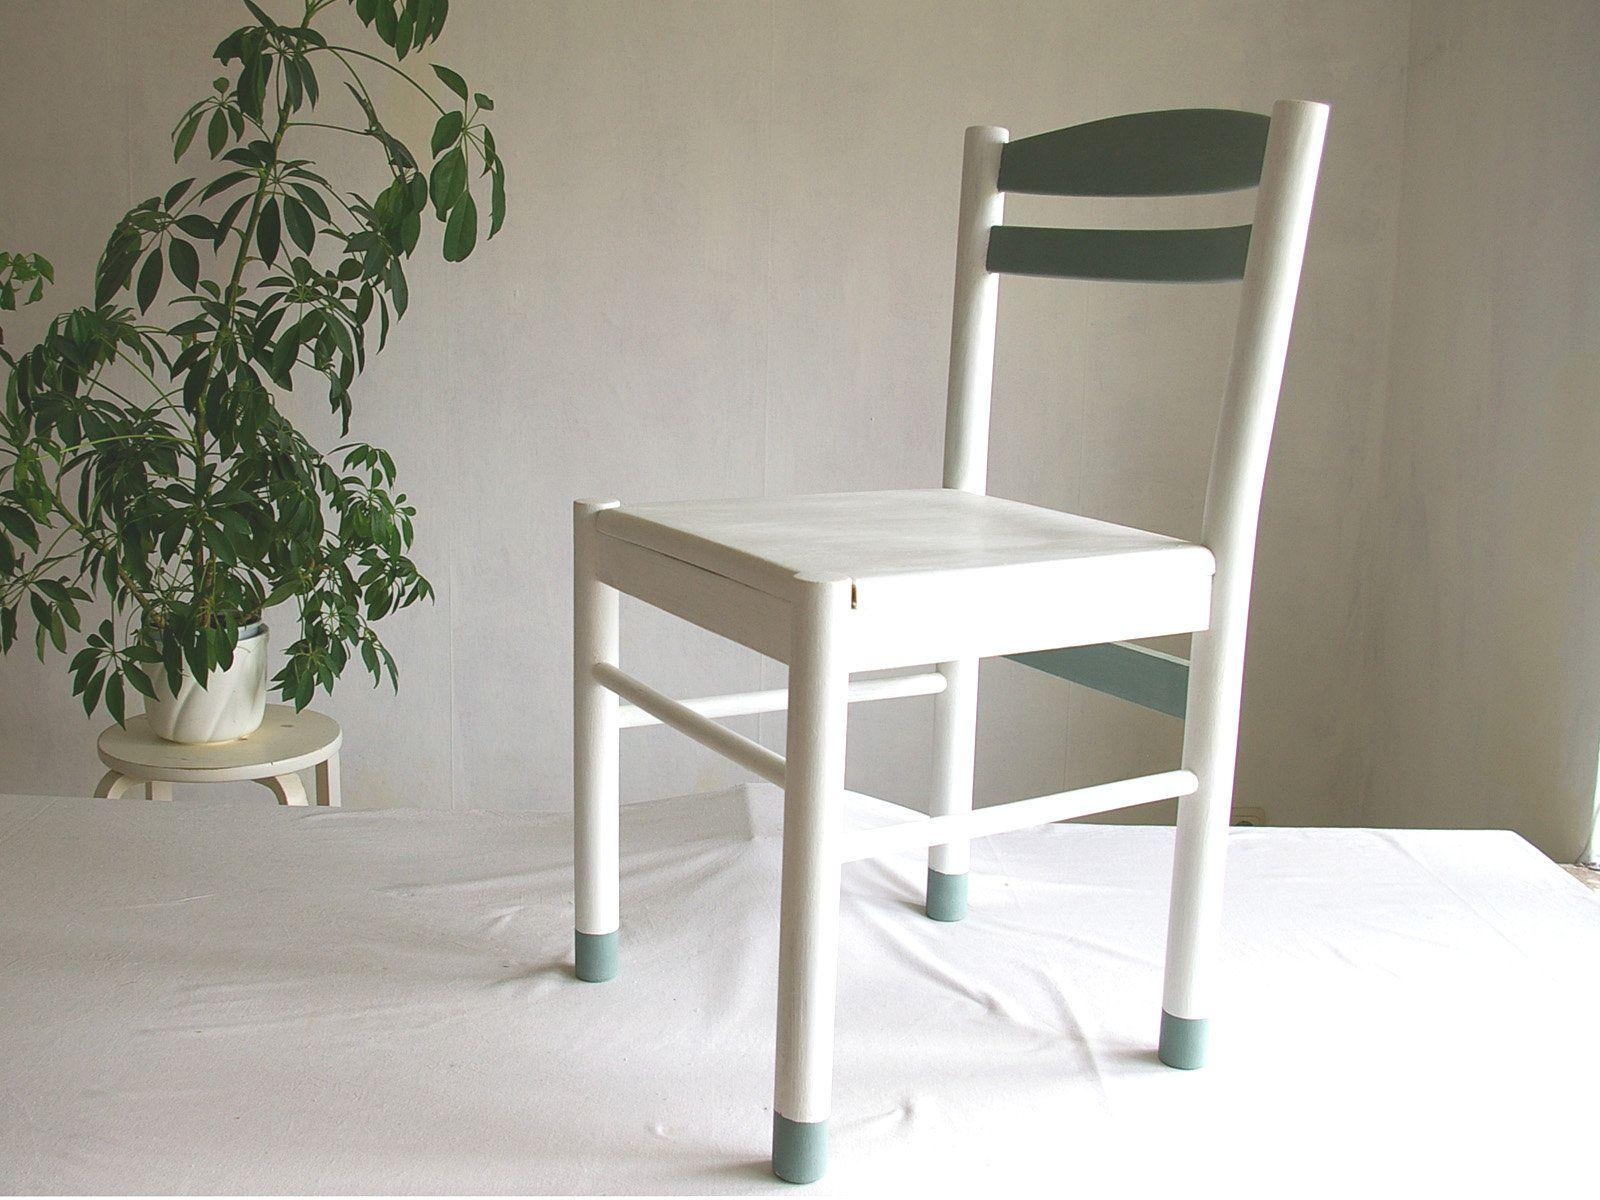 Stuhl Holzstuhl Lehnstuhl Weiß Mit Grau Küchenstuhl